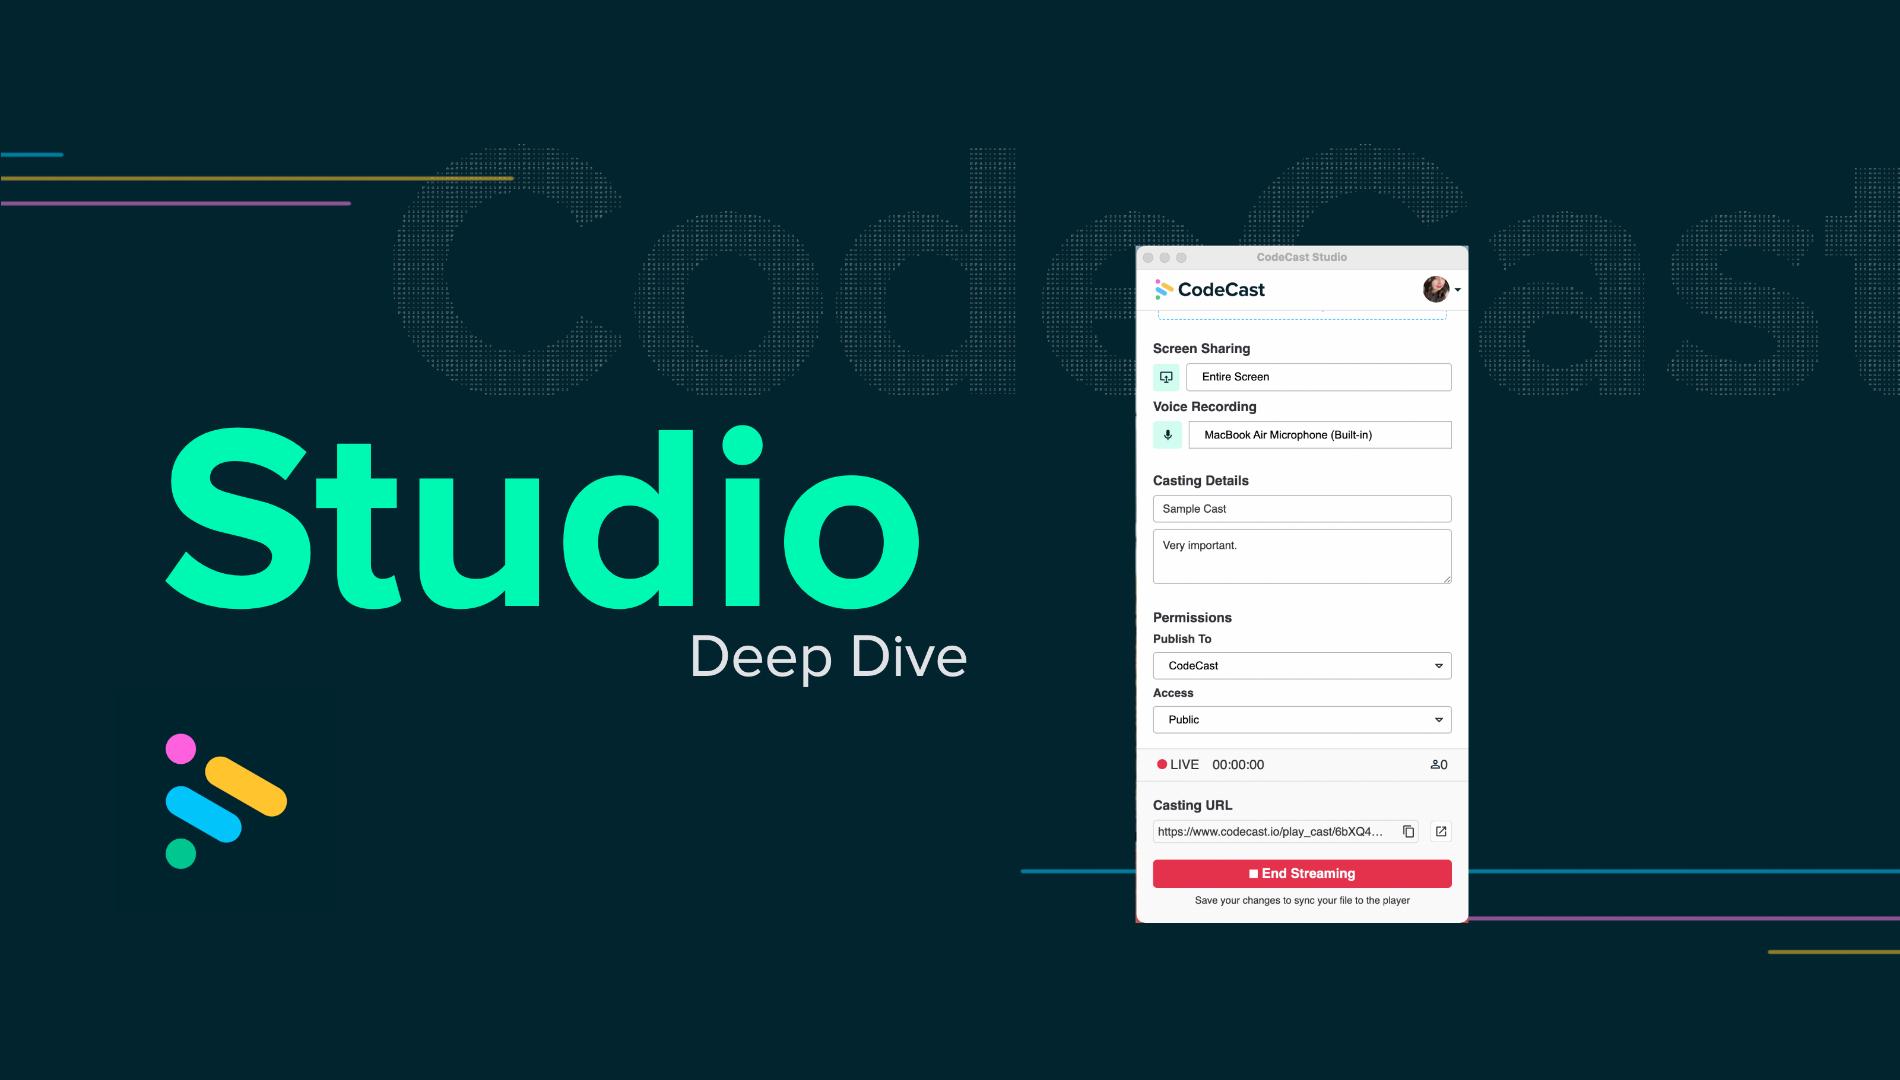 Studio Deep Dive